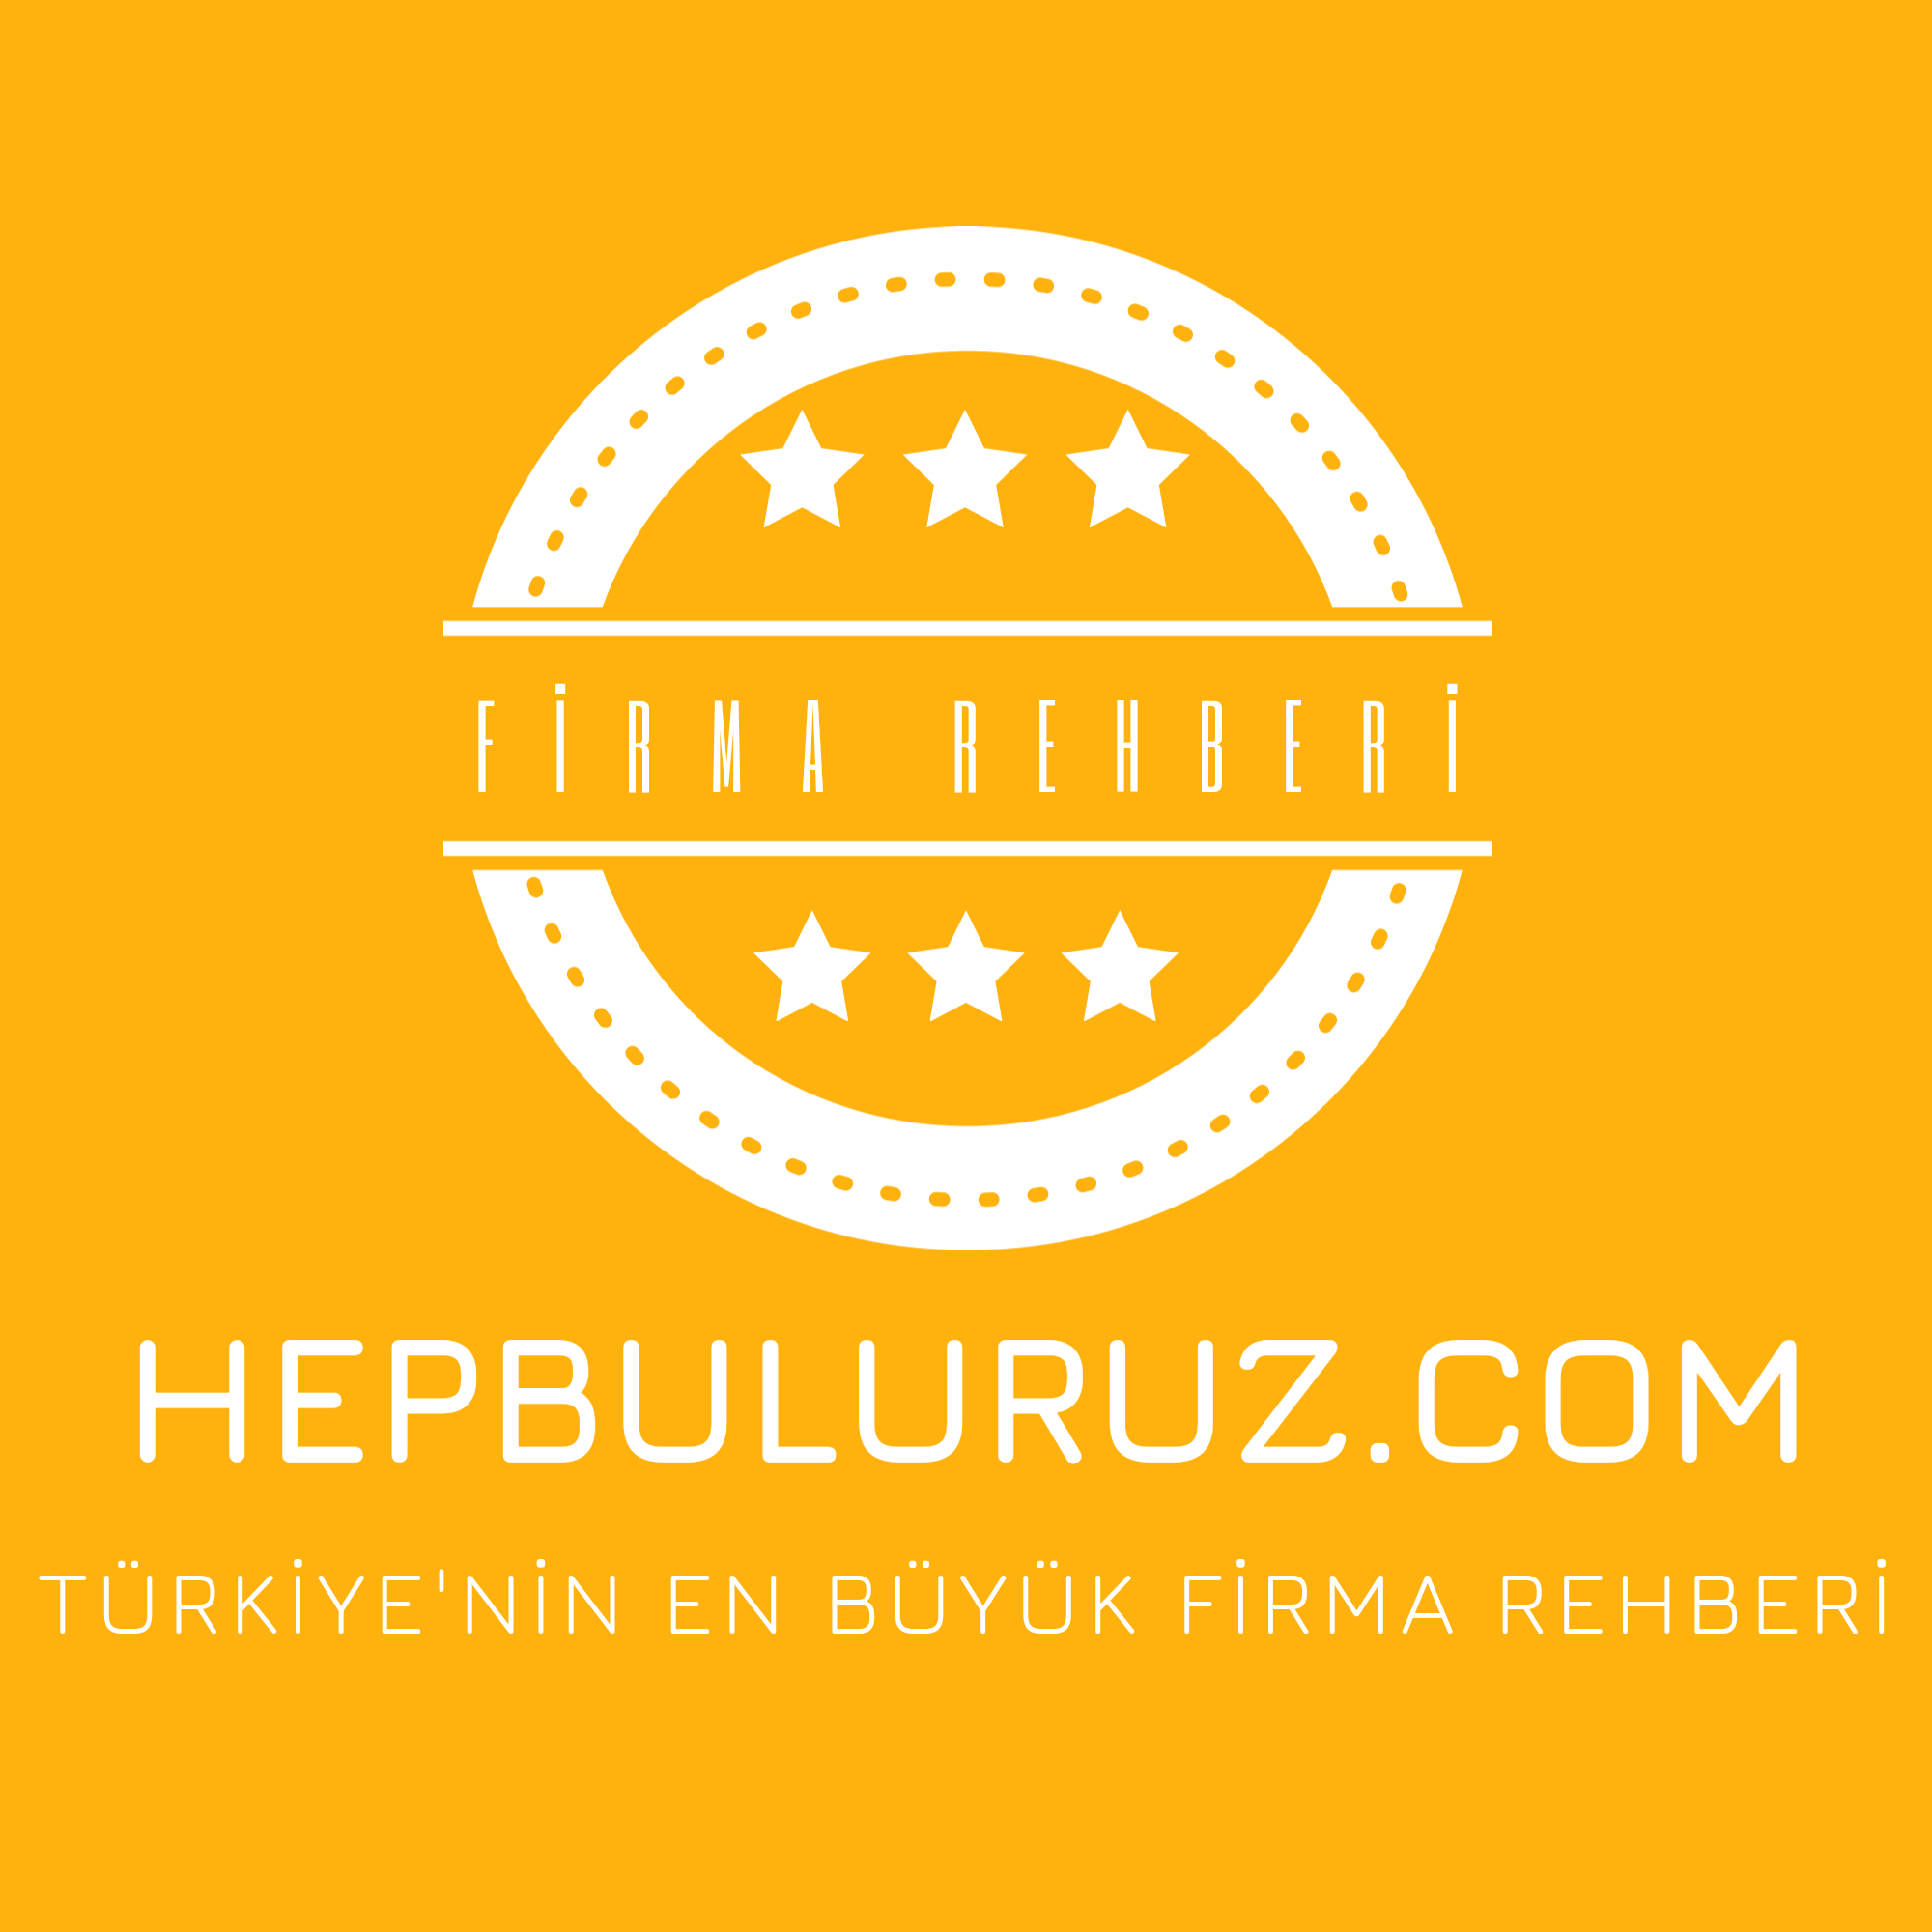 Yuzukcafe.com